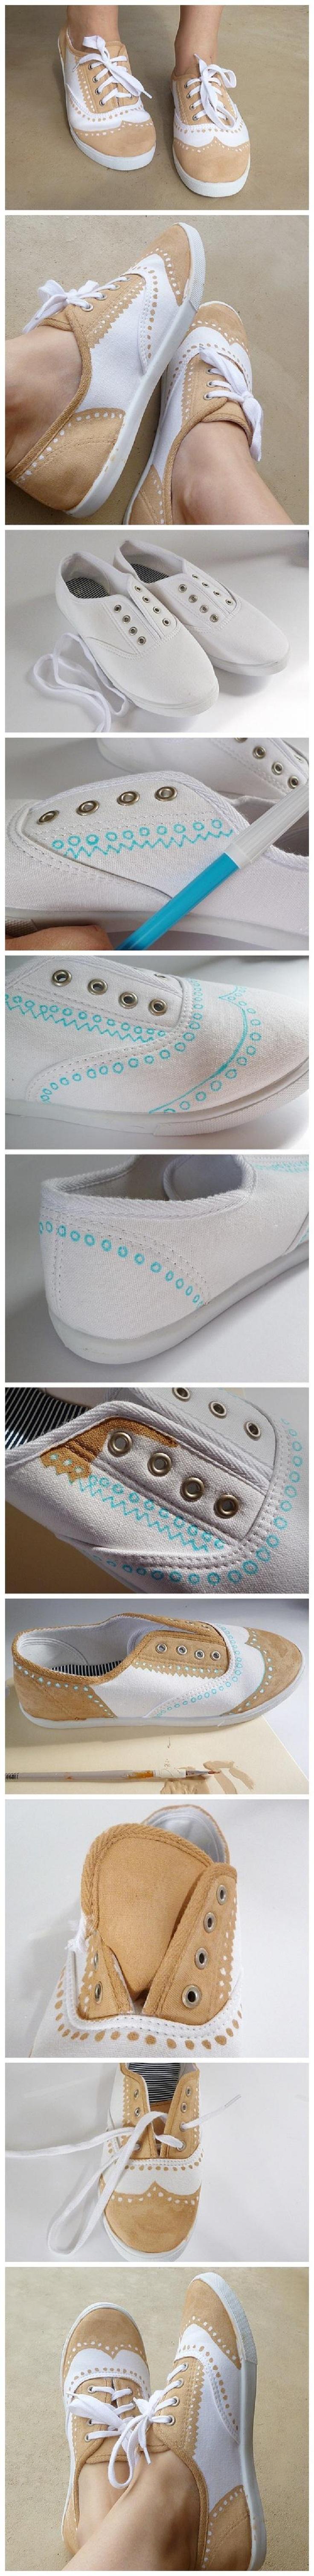 top-10-diy-female-shoes_06